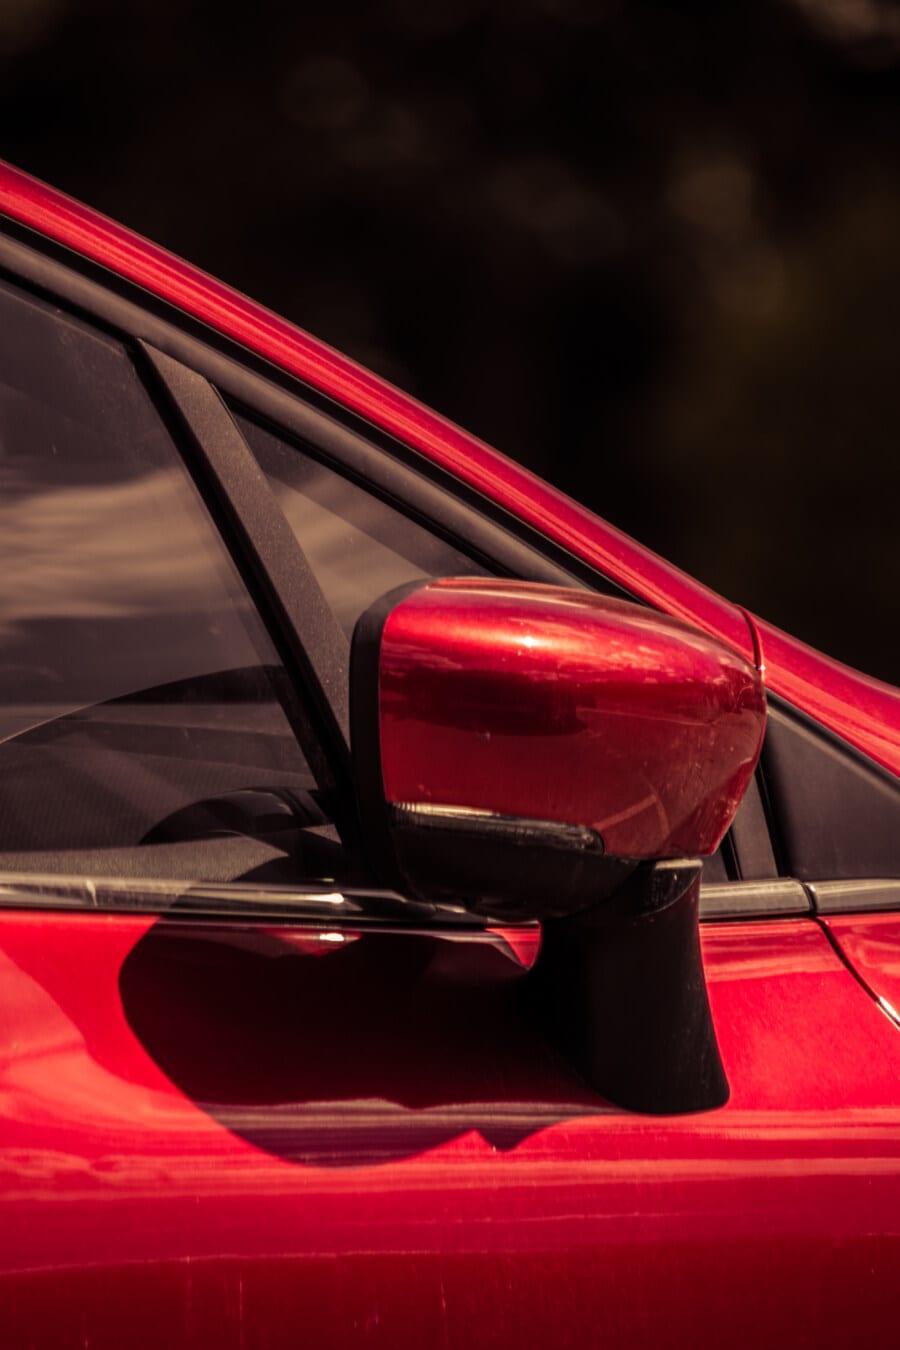 side view, mirror, automobile, close-up, window, reddish, paint, metallic, car, vehicle